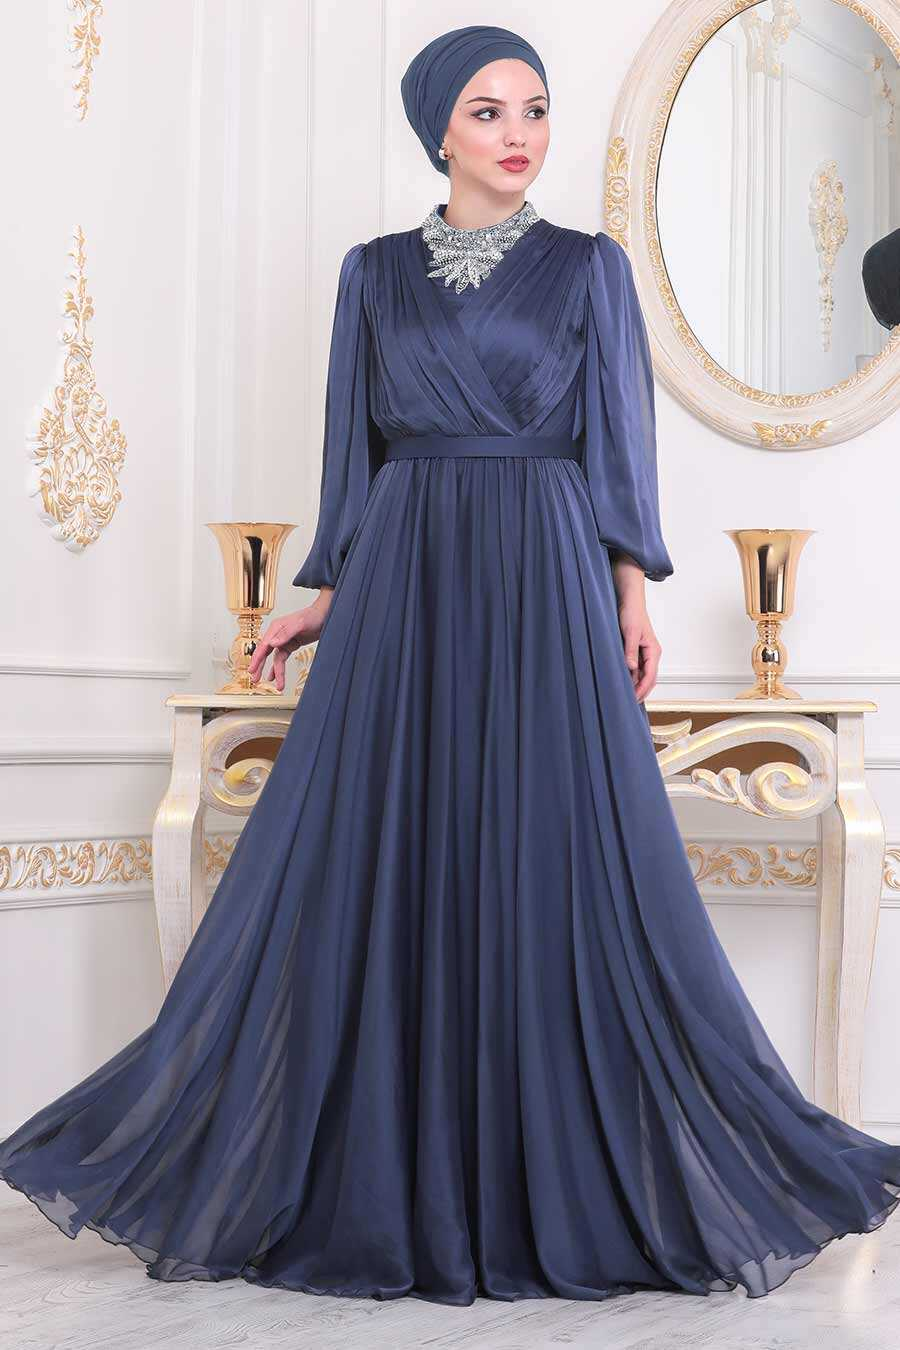 İndigo Blue Hijab Evening Dress 40550IM